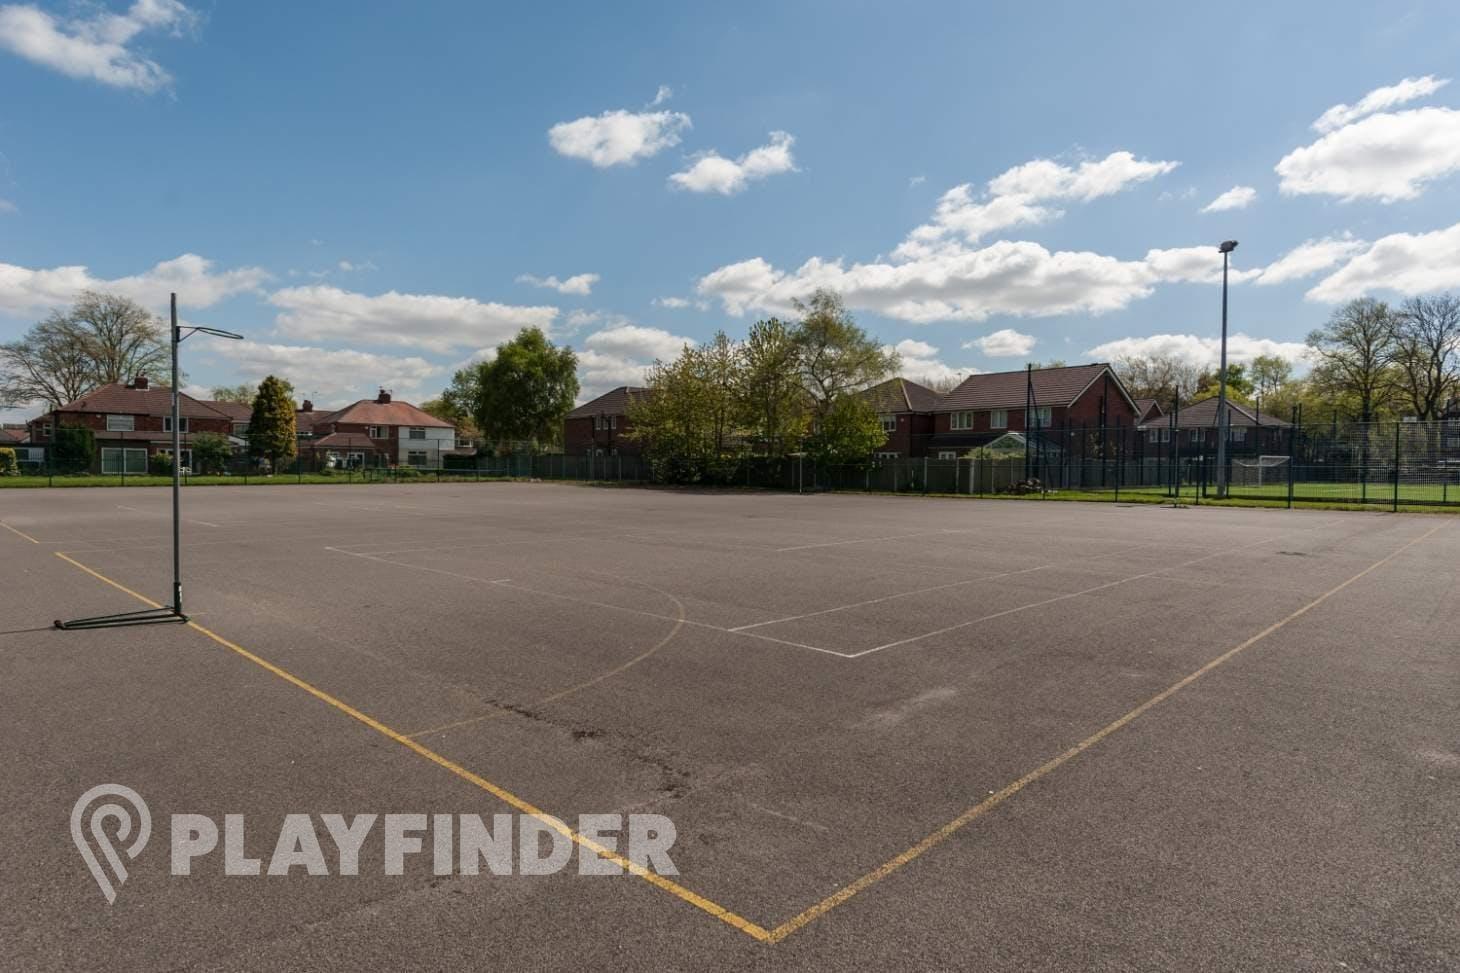 Flixton Girls School Outdoor | Concrete tennis court